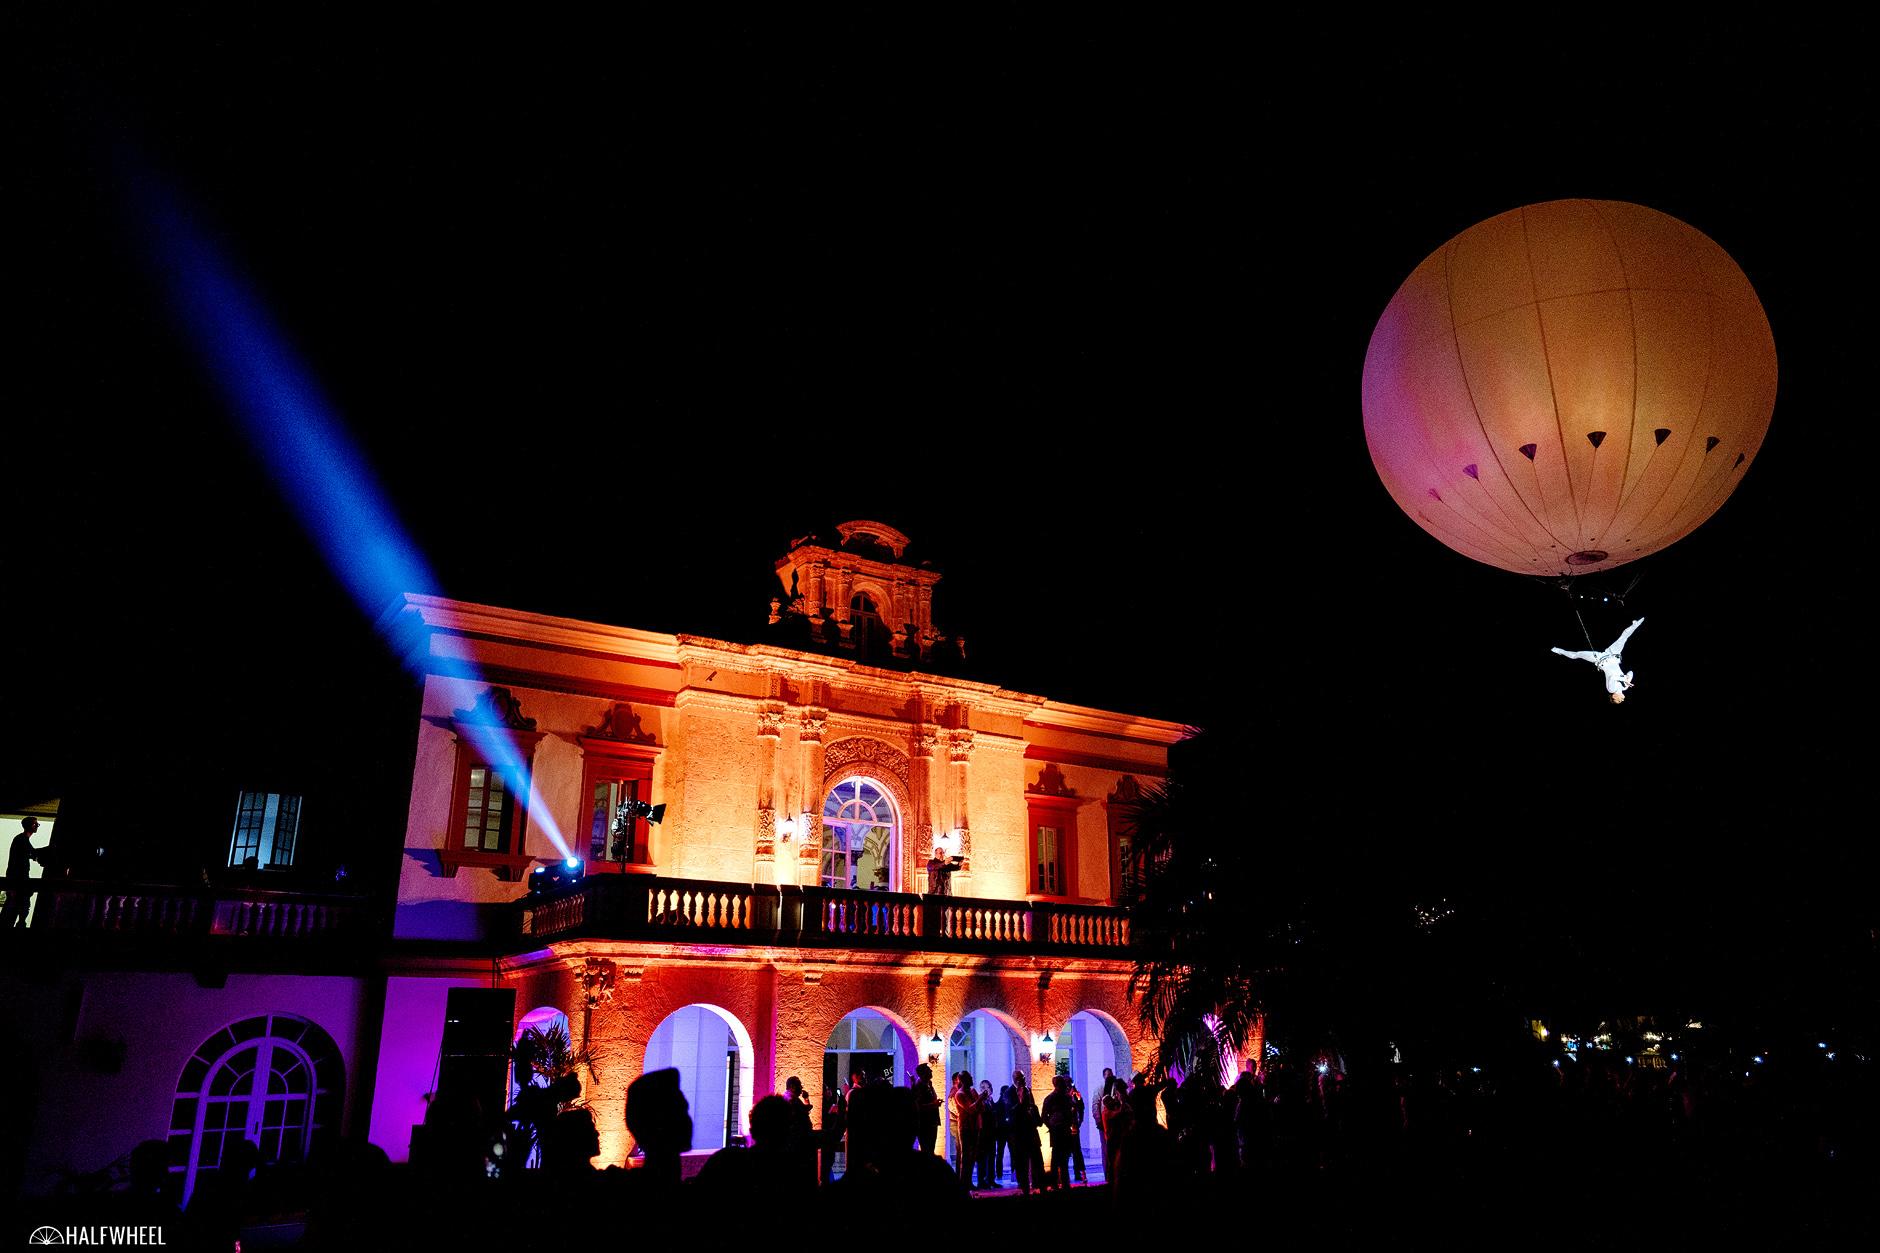 xxli-festival-del-habano-szivarfesztival-kuba-szivarom_10.jpg